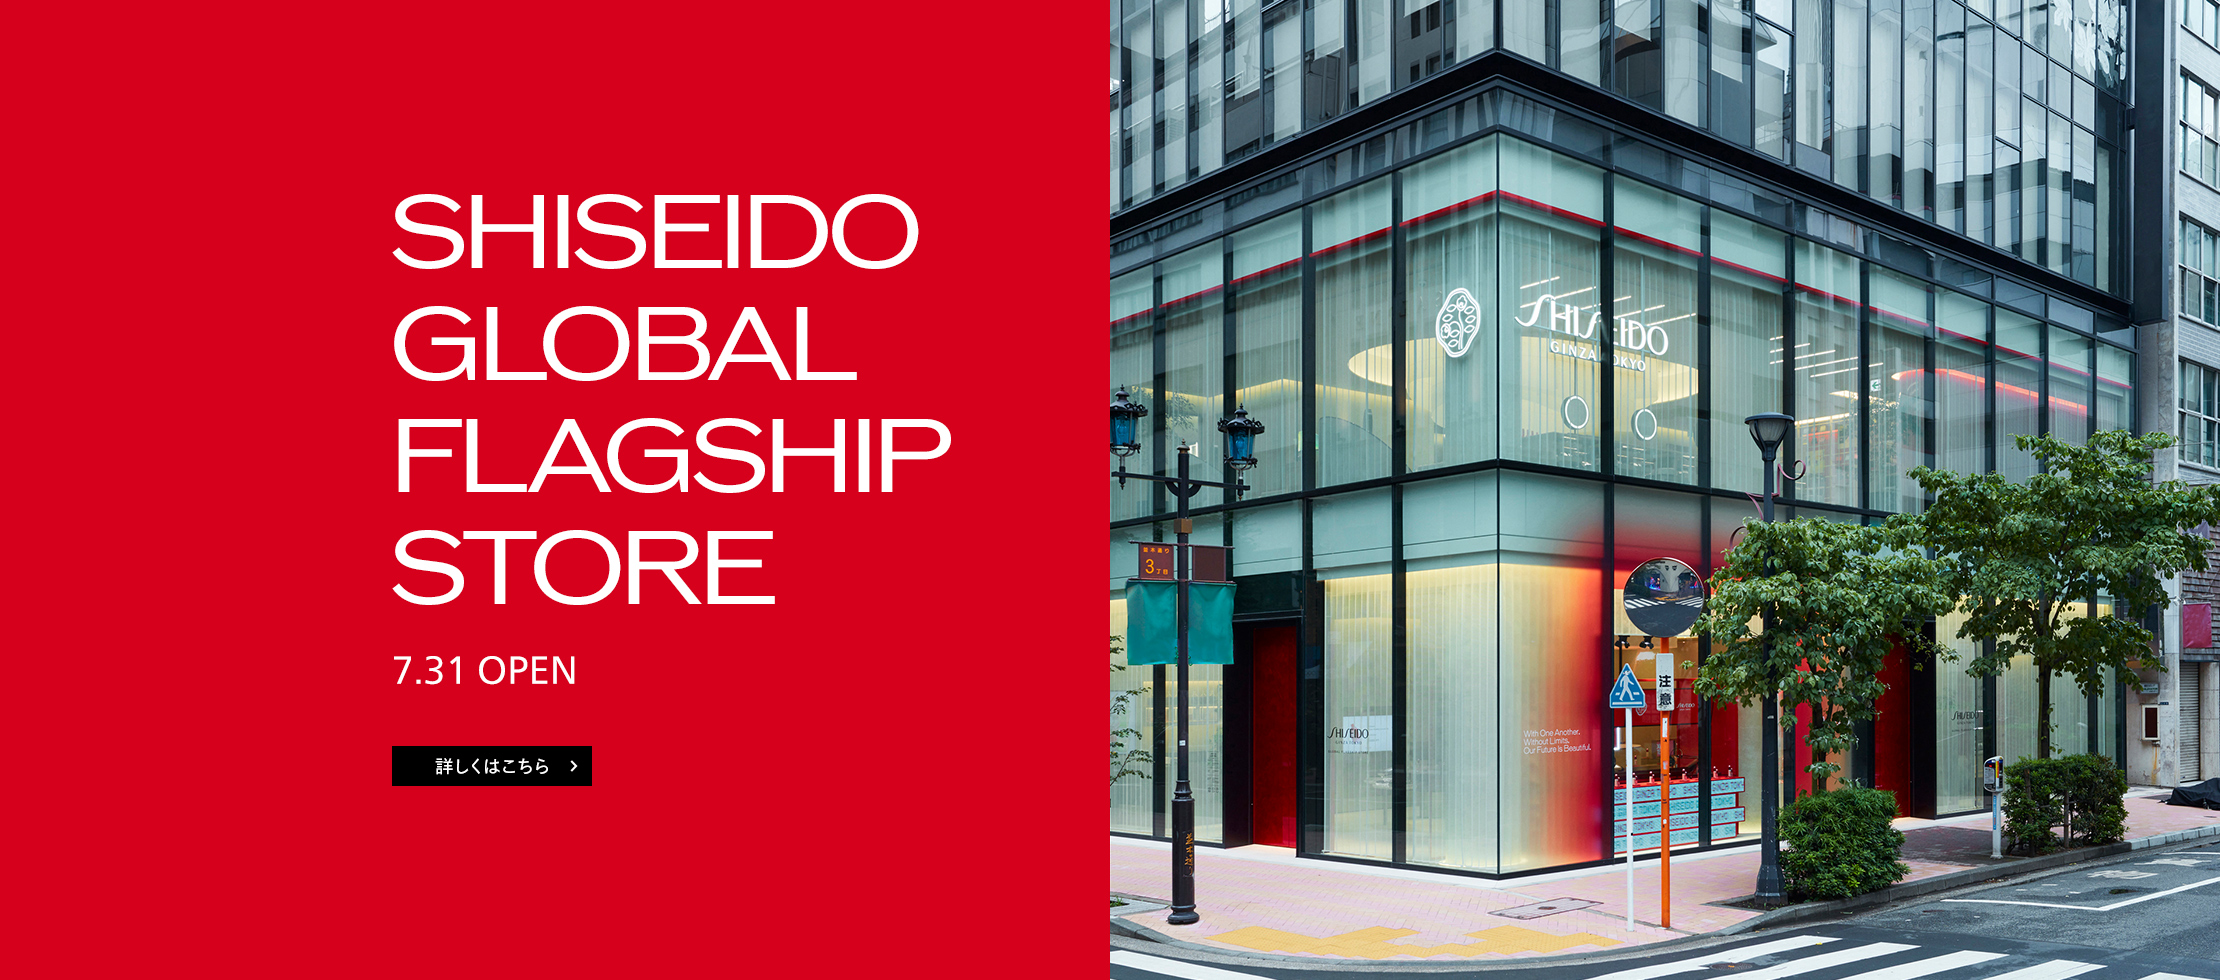 「SHISEIDO」初のブランド旗艦店で、美を体験する。